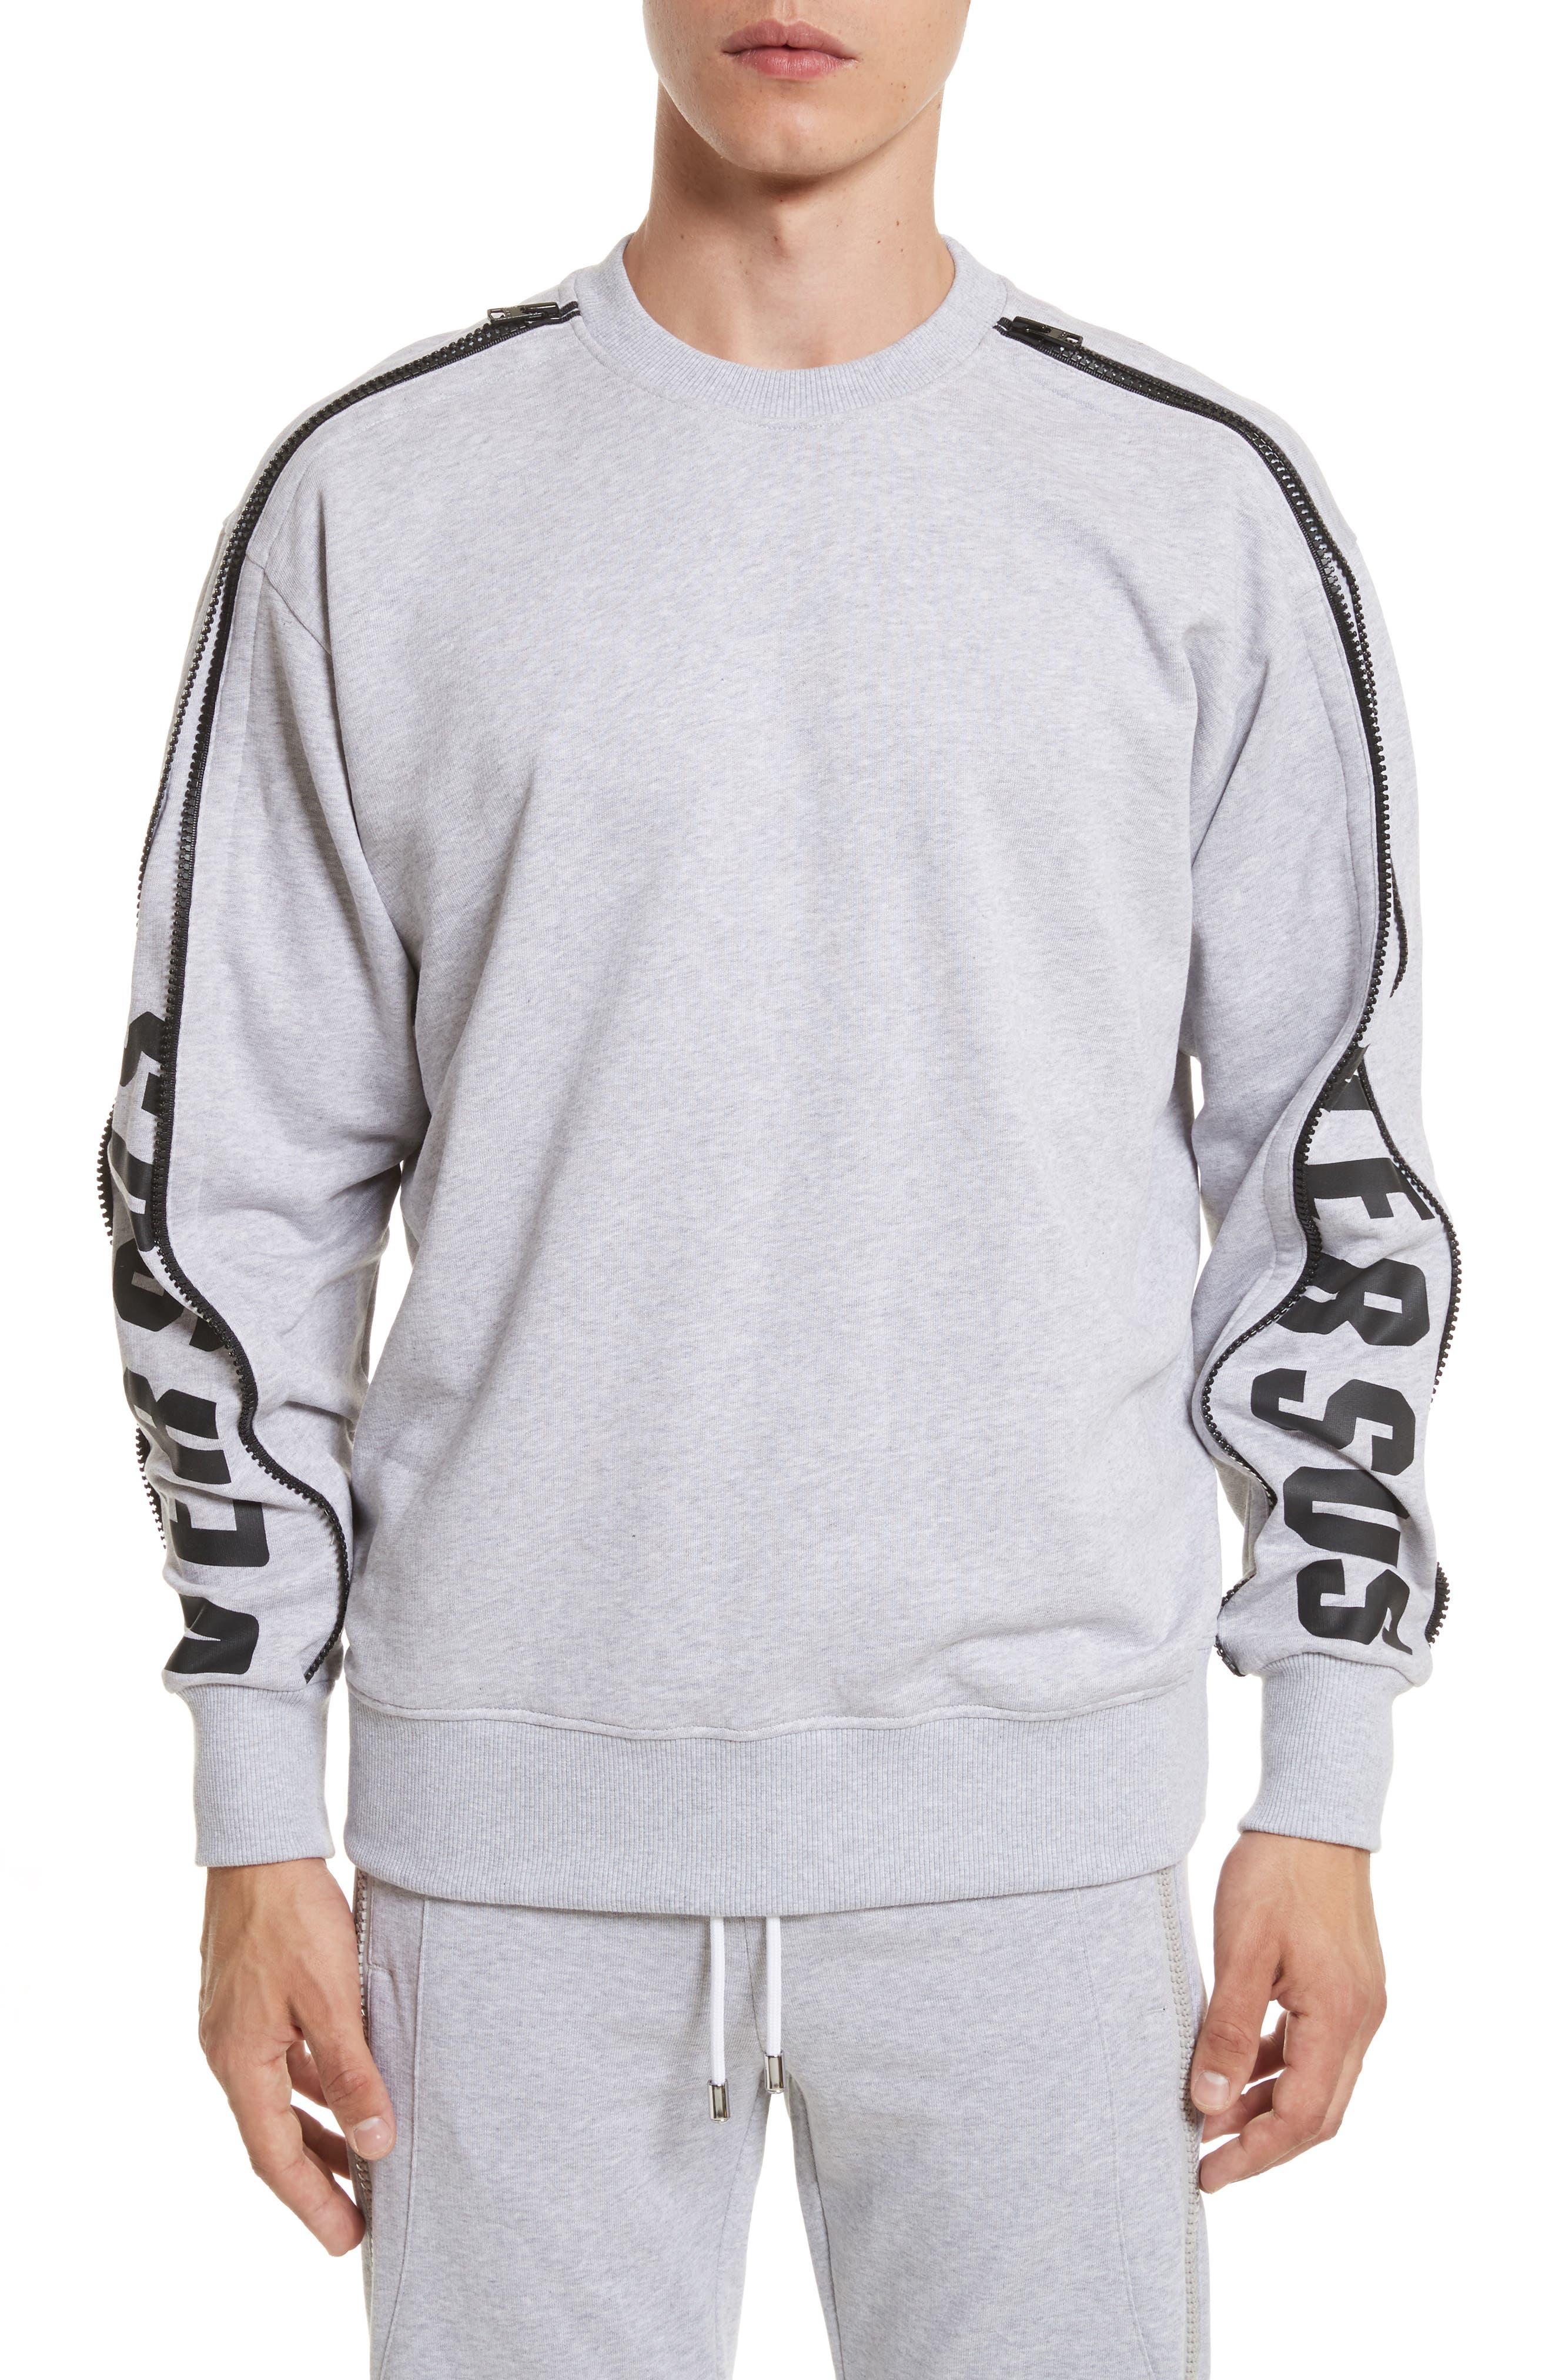 Zip Sleeve Crewneck Sweatshirt,                             Main thumbnail 1, color,                             GREY